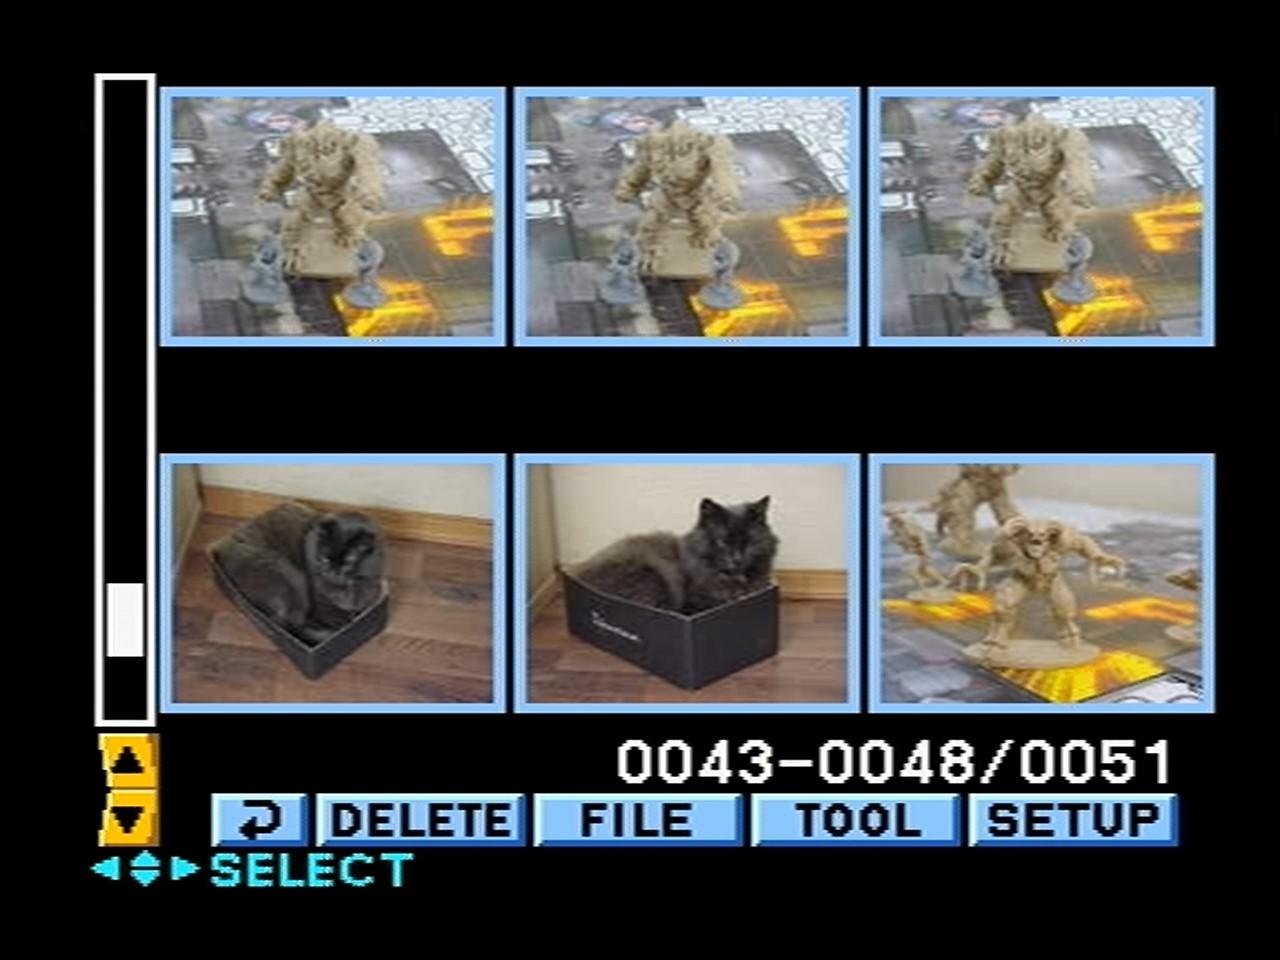 Фотоаппарат на дискетах: 8 интересных фактов о Sony Mavica MVC-FD85 (много картинок) - 11